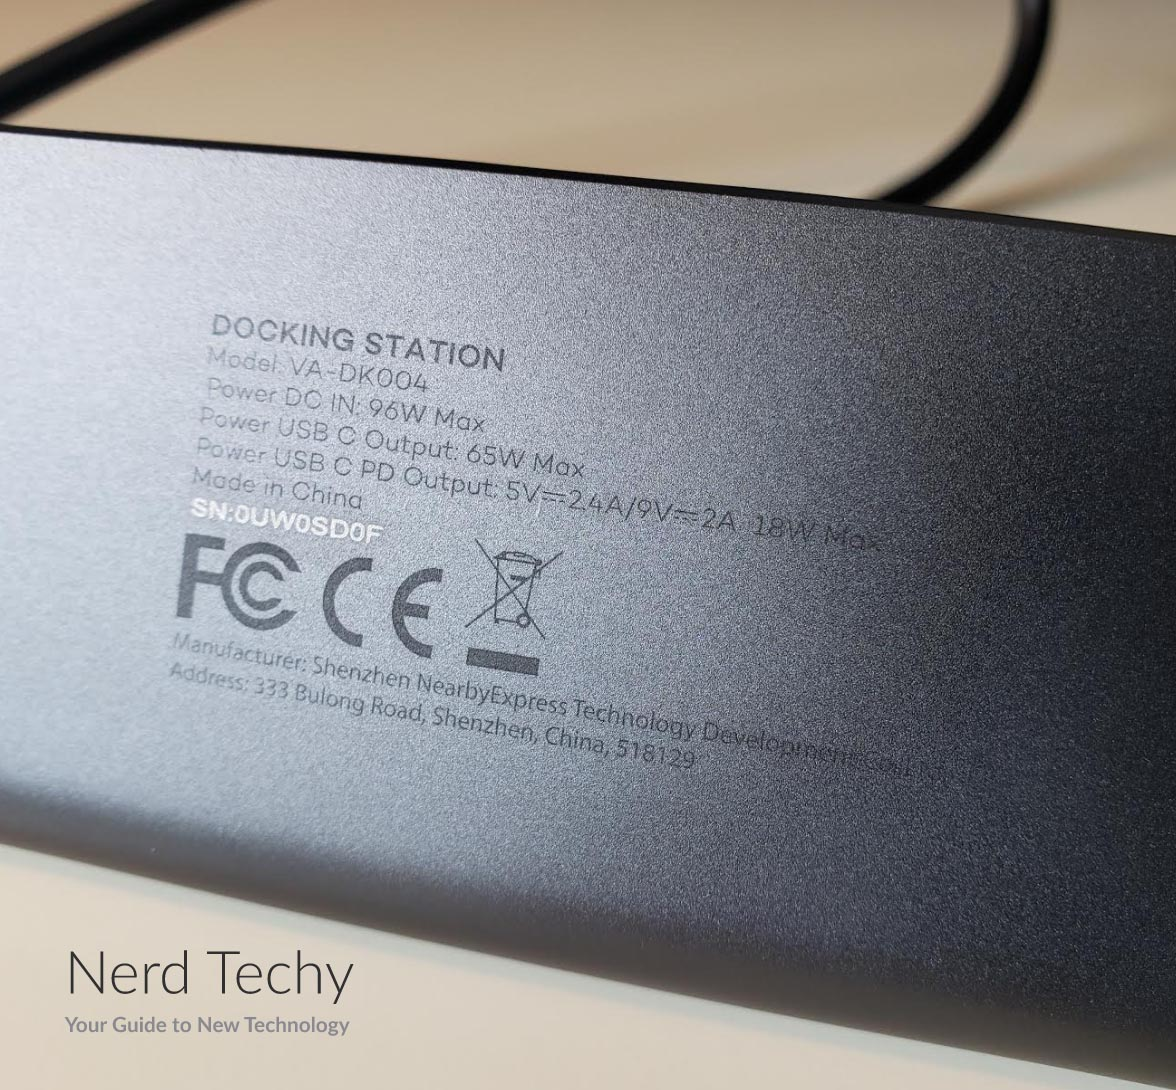 VAVA USB C Docking Station